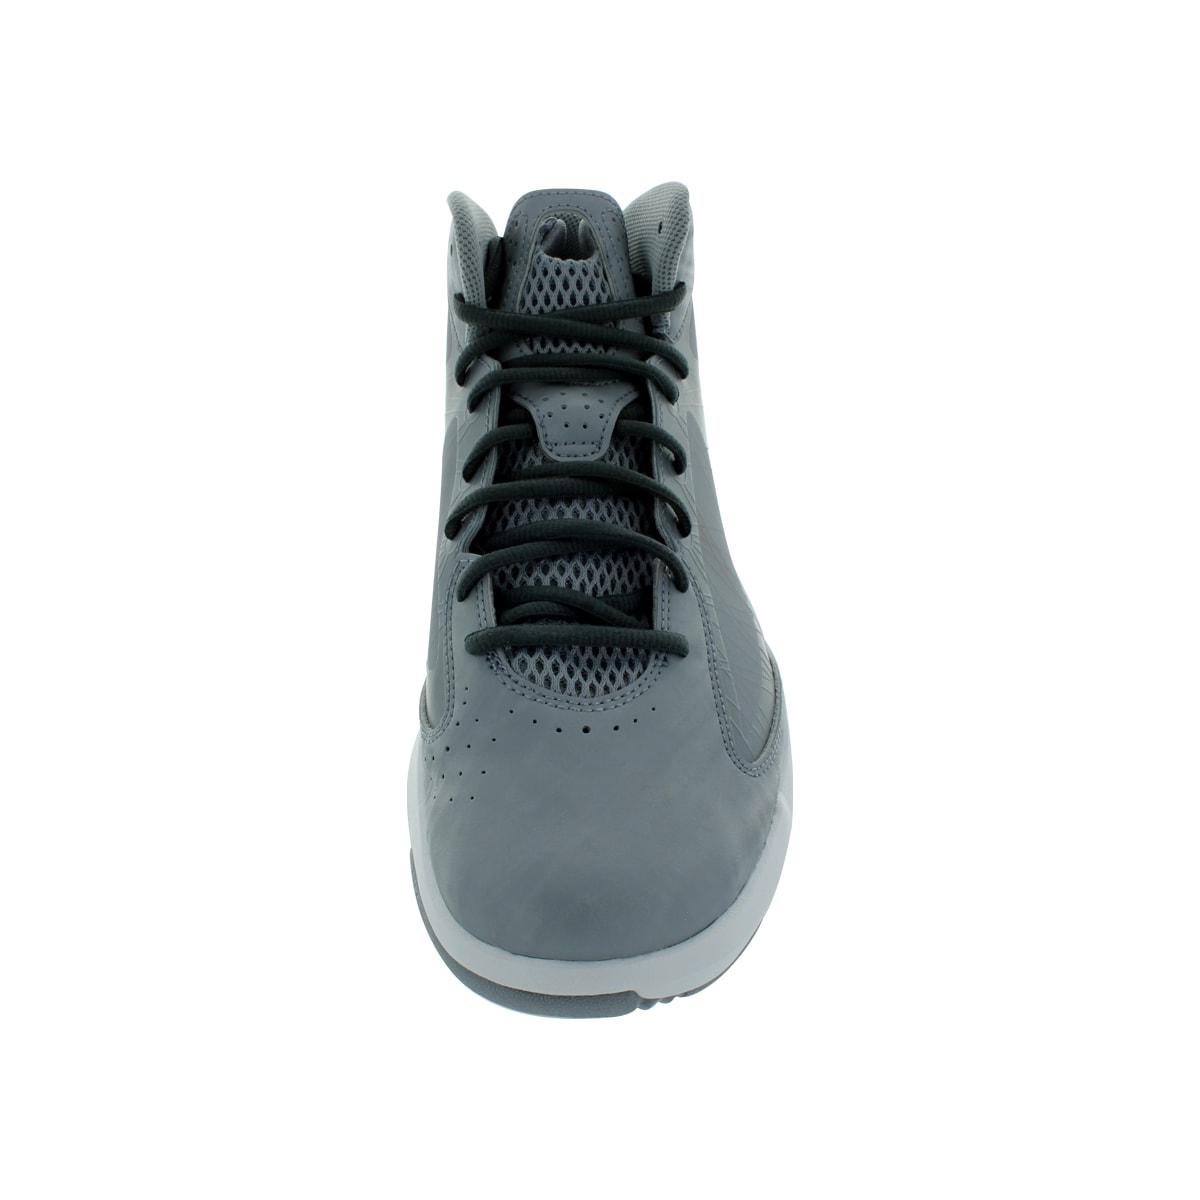 b26964a236a5 Nike-Jordan-Aero-Flight-Basketball-Shoe -a3280bc6-0dd9-4427-b1c7-b8f6165d7c3d.jpg